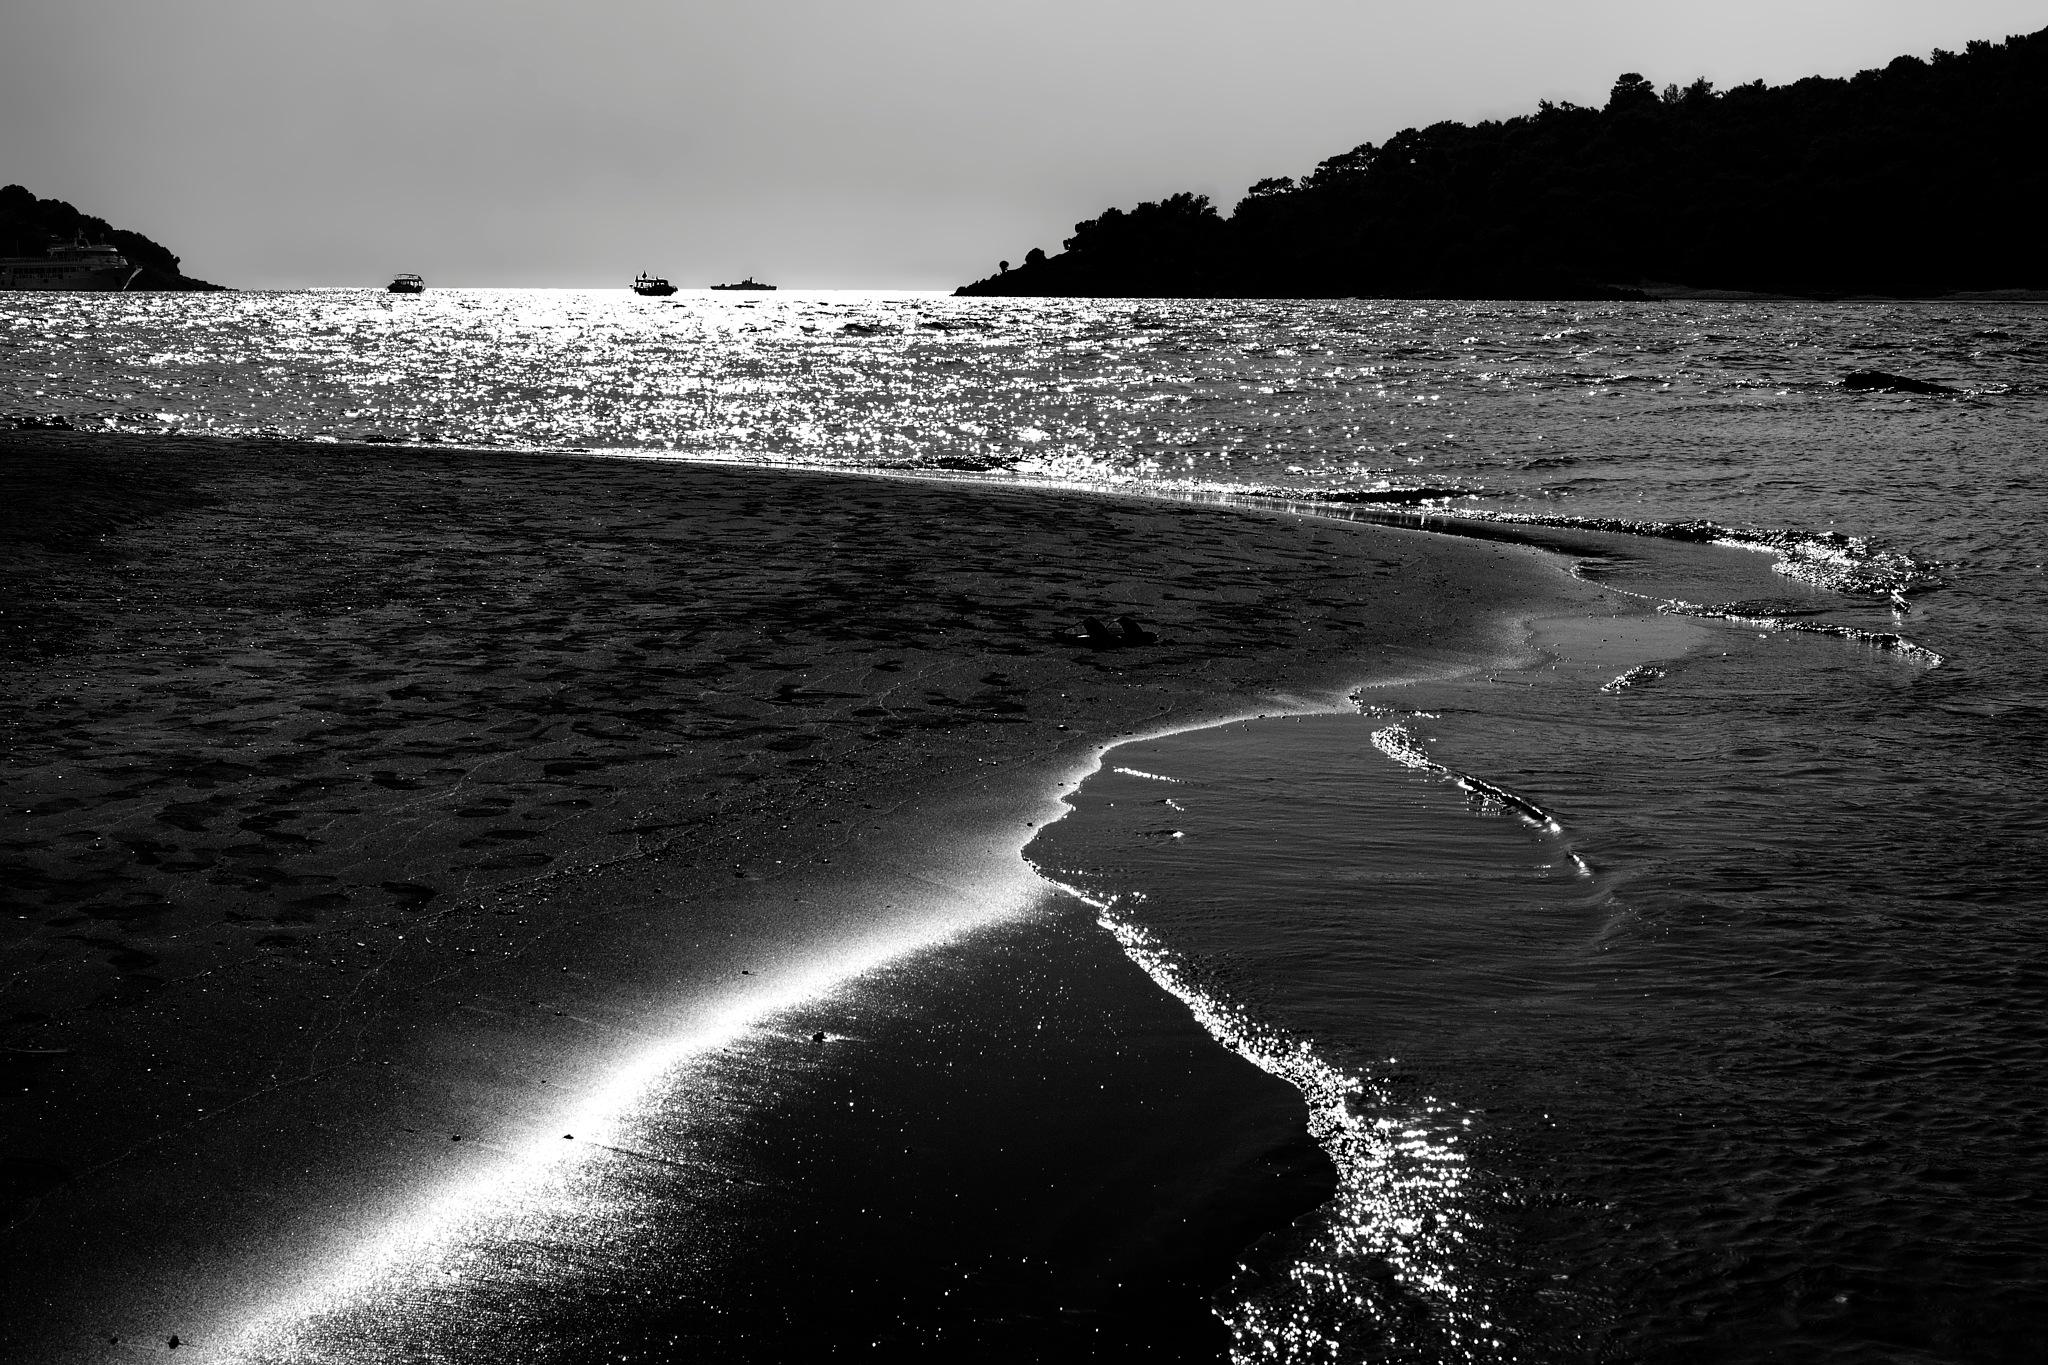 sea-scape by Muhsin Özcan